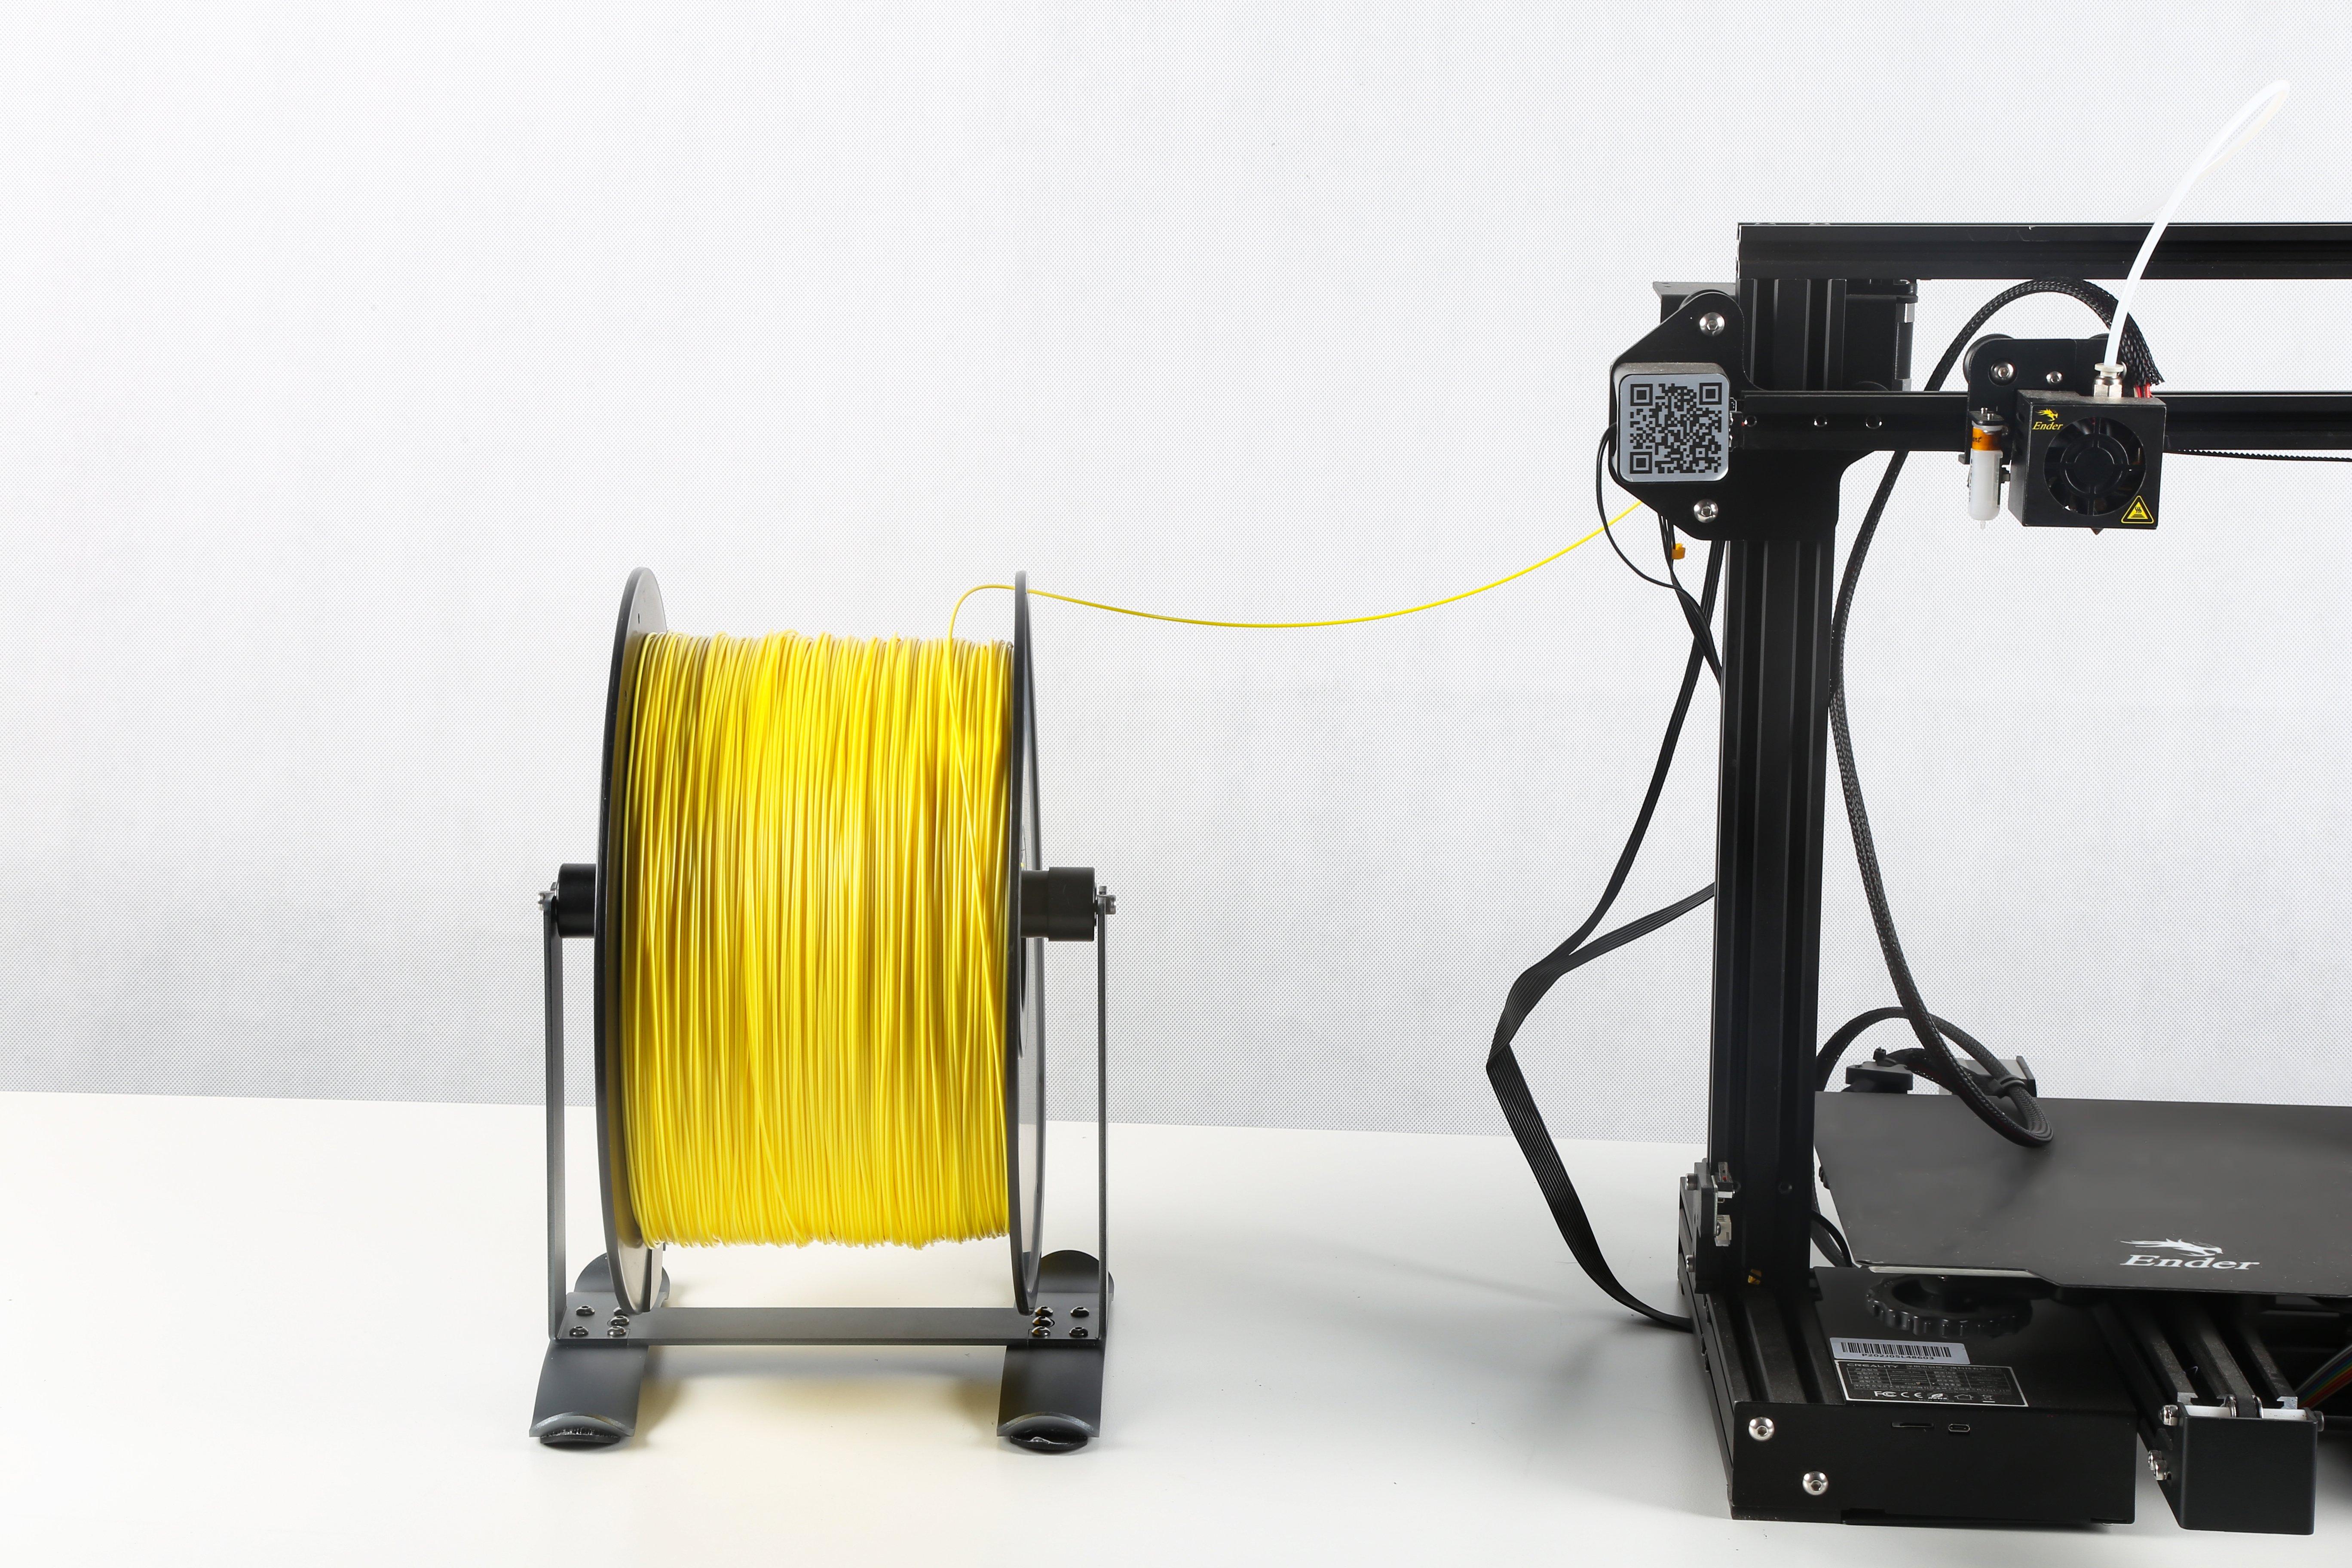 3d printer filament holder